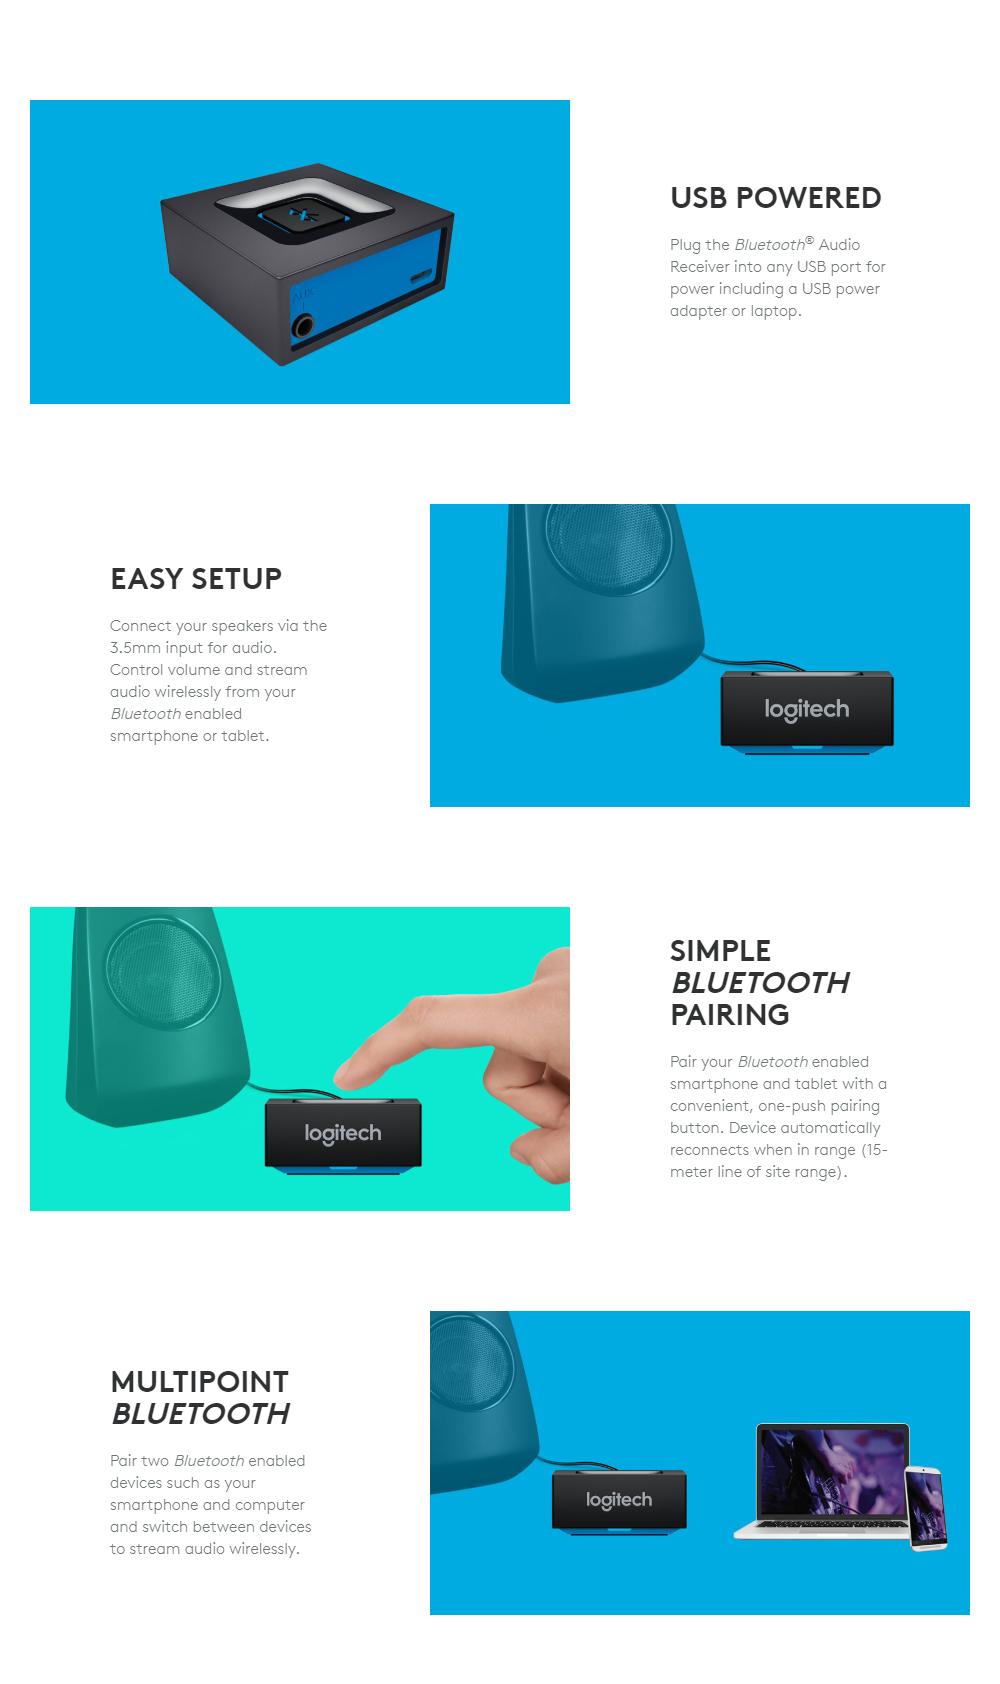 Logitech Bluetooth Audio Receiver (USB Powered)